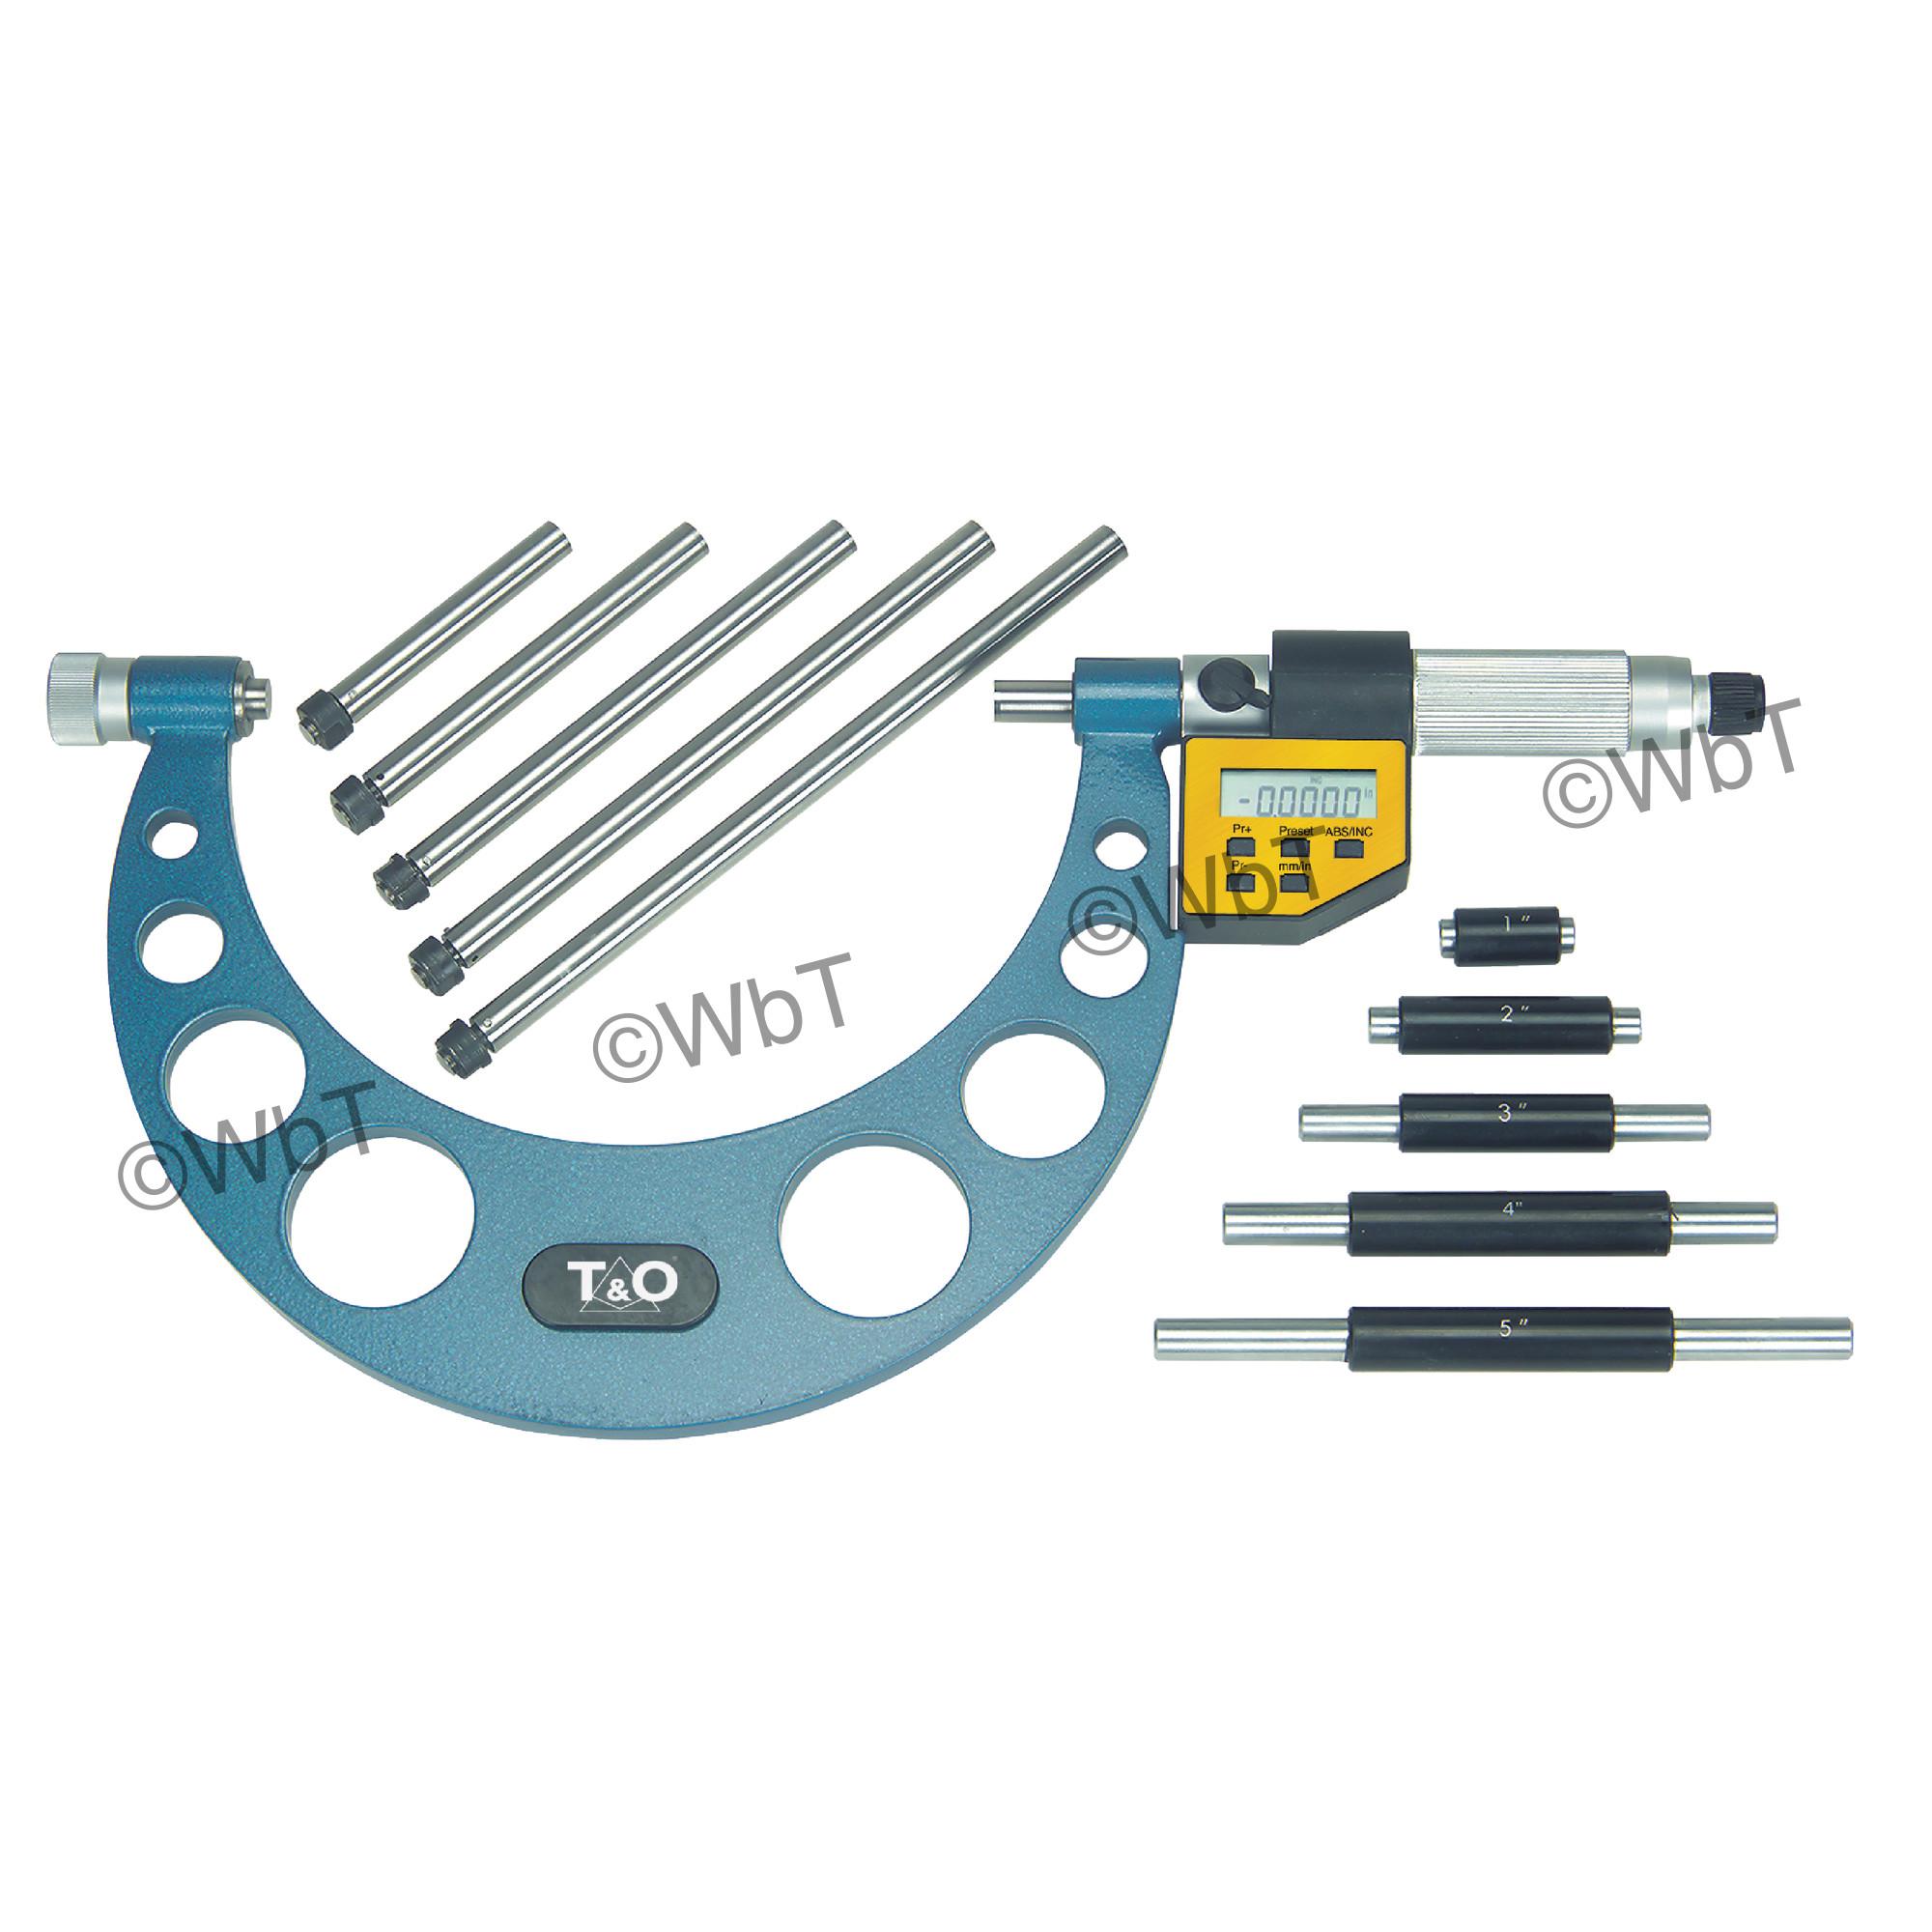 Digital Interchangeable Anvil Micrometer Set